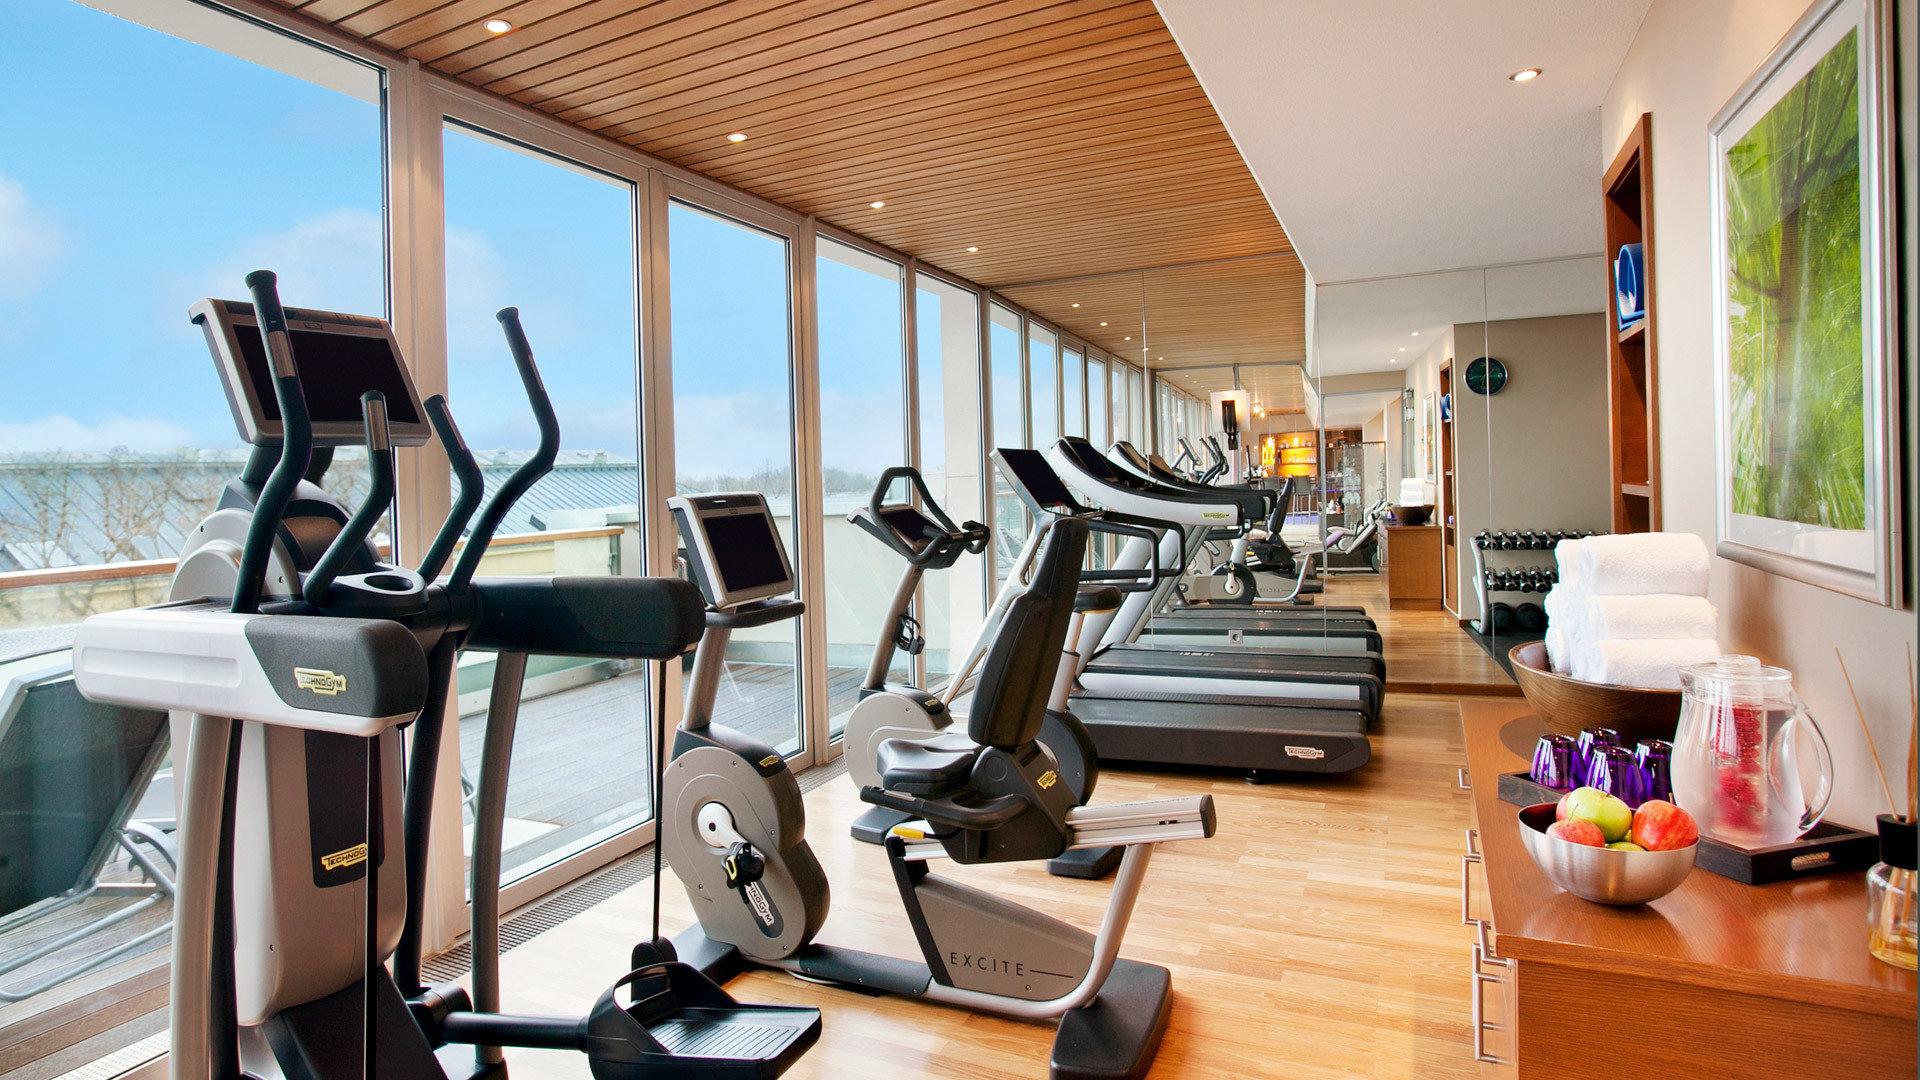 structure property chair condominium leisure sport venue home Resort gym Suite